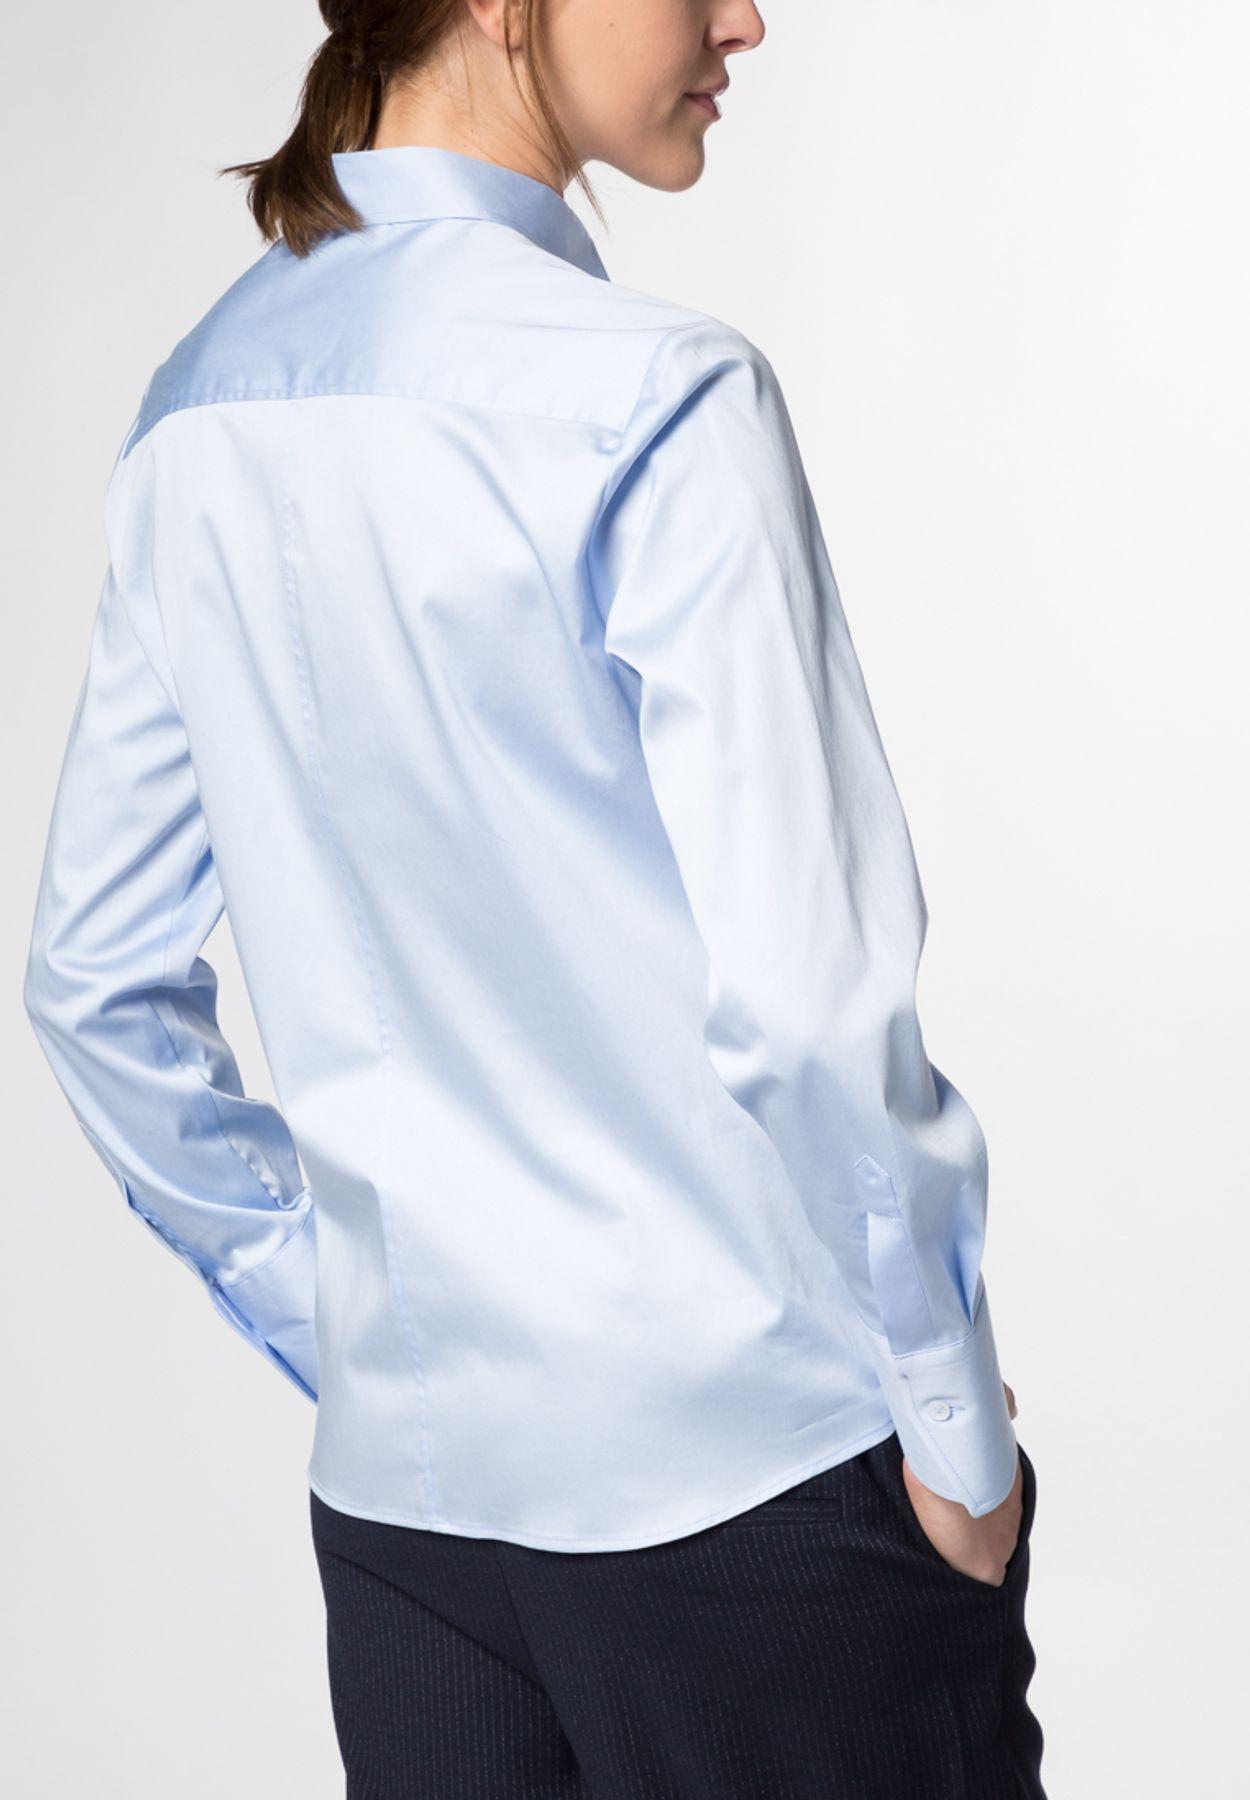 Eterna - Comfort Fit - Damen Langarm Bluse Modern Classic Stretch in versch. Farben (5352 D708) – Bild 8